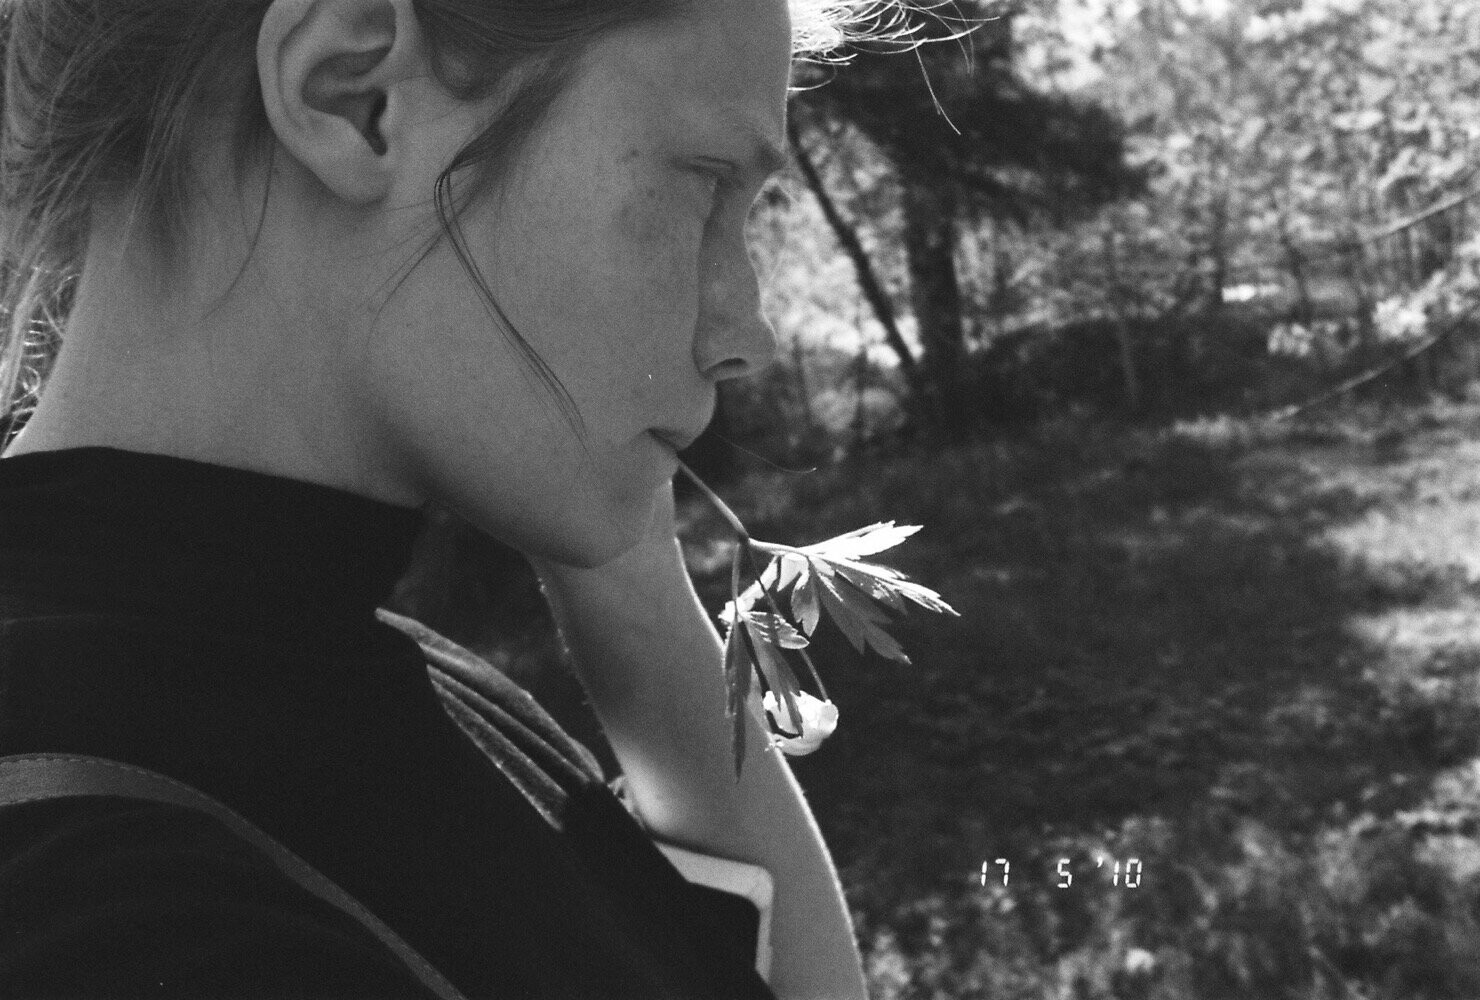 2010 год. Фотограф Лина Шейниус